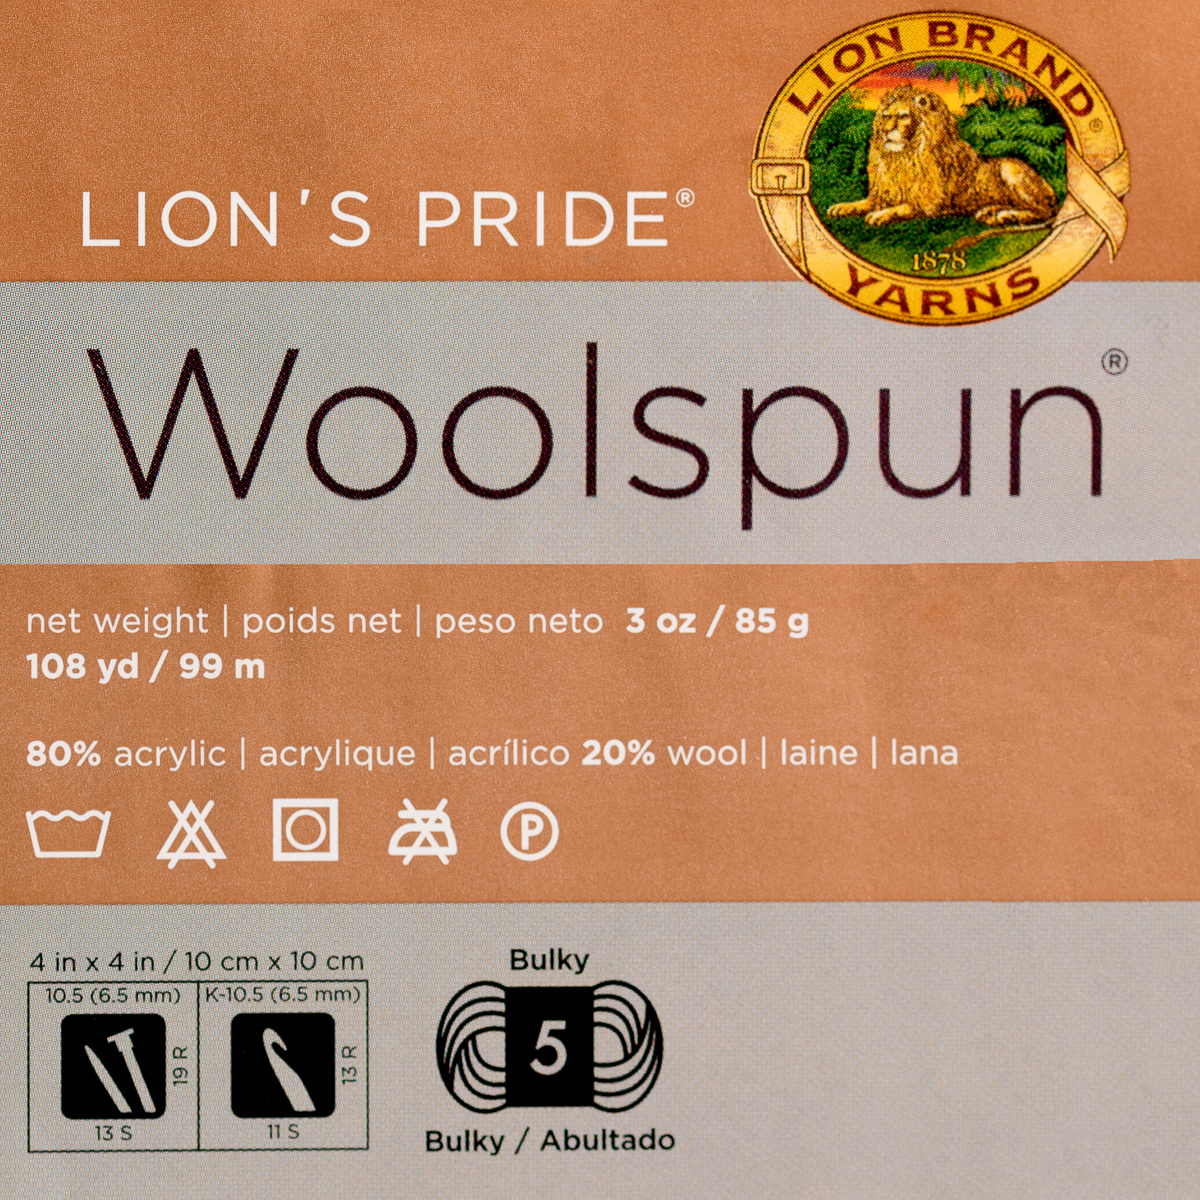 3pk-Lion-Brand-Woolspun-Acrylic-amp-Wool-Yarn-Bulky-5-Knit-Crocheting-Skeins-Soft thumbnail 24